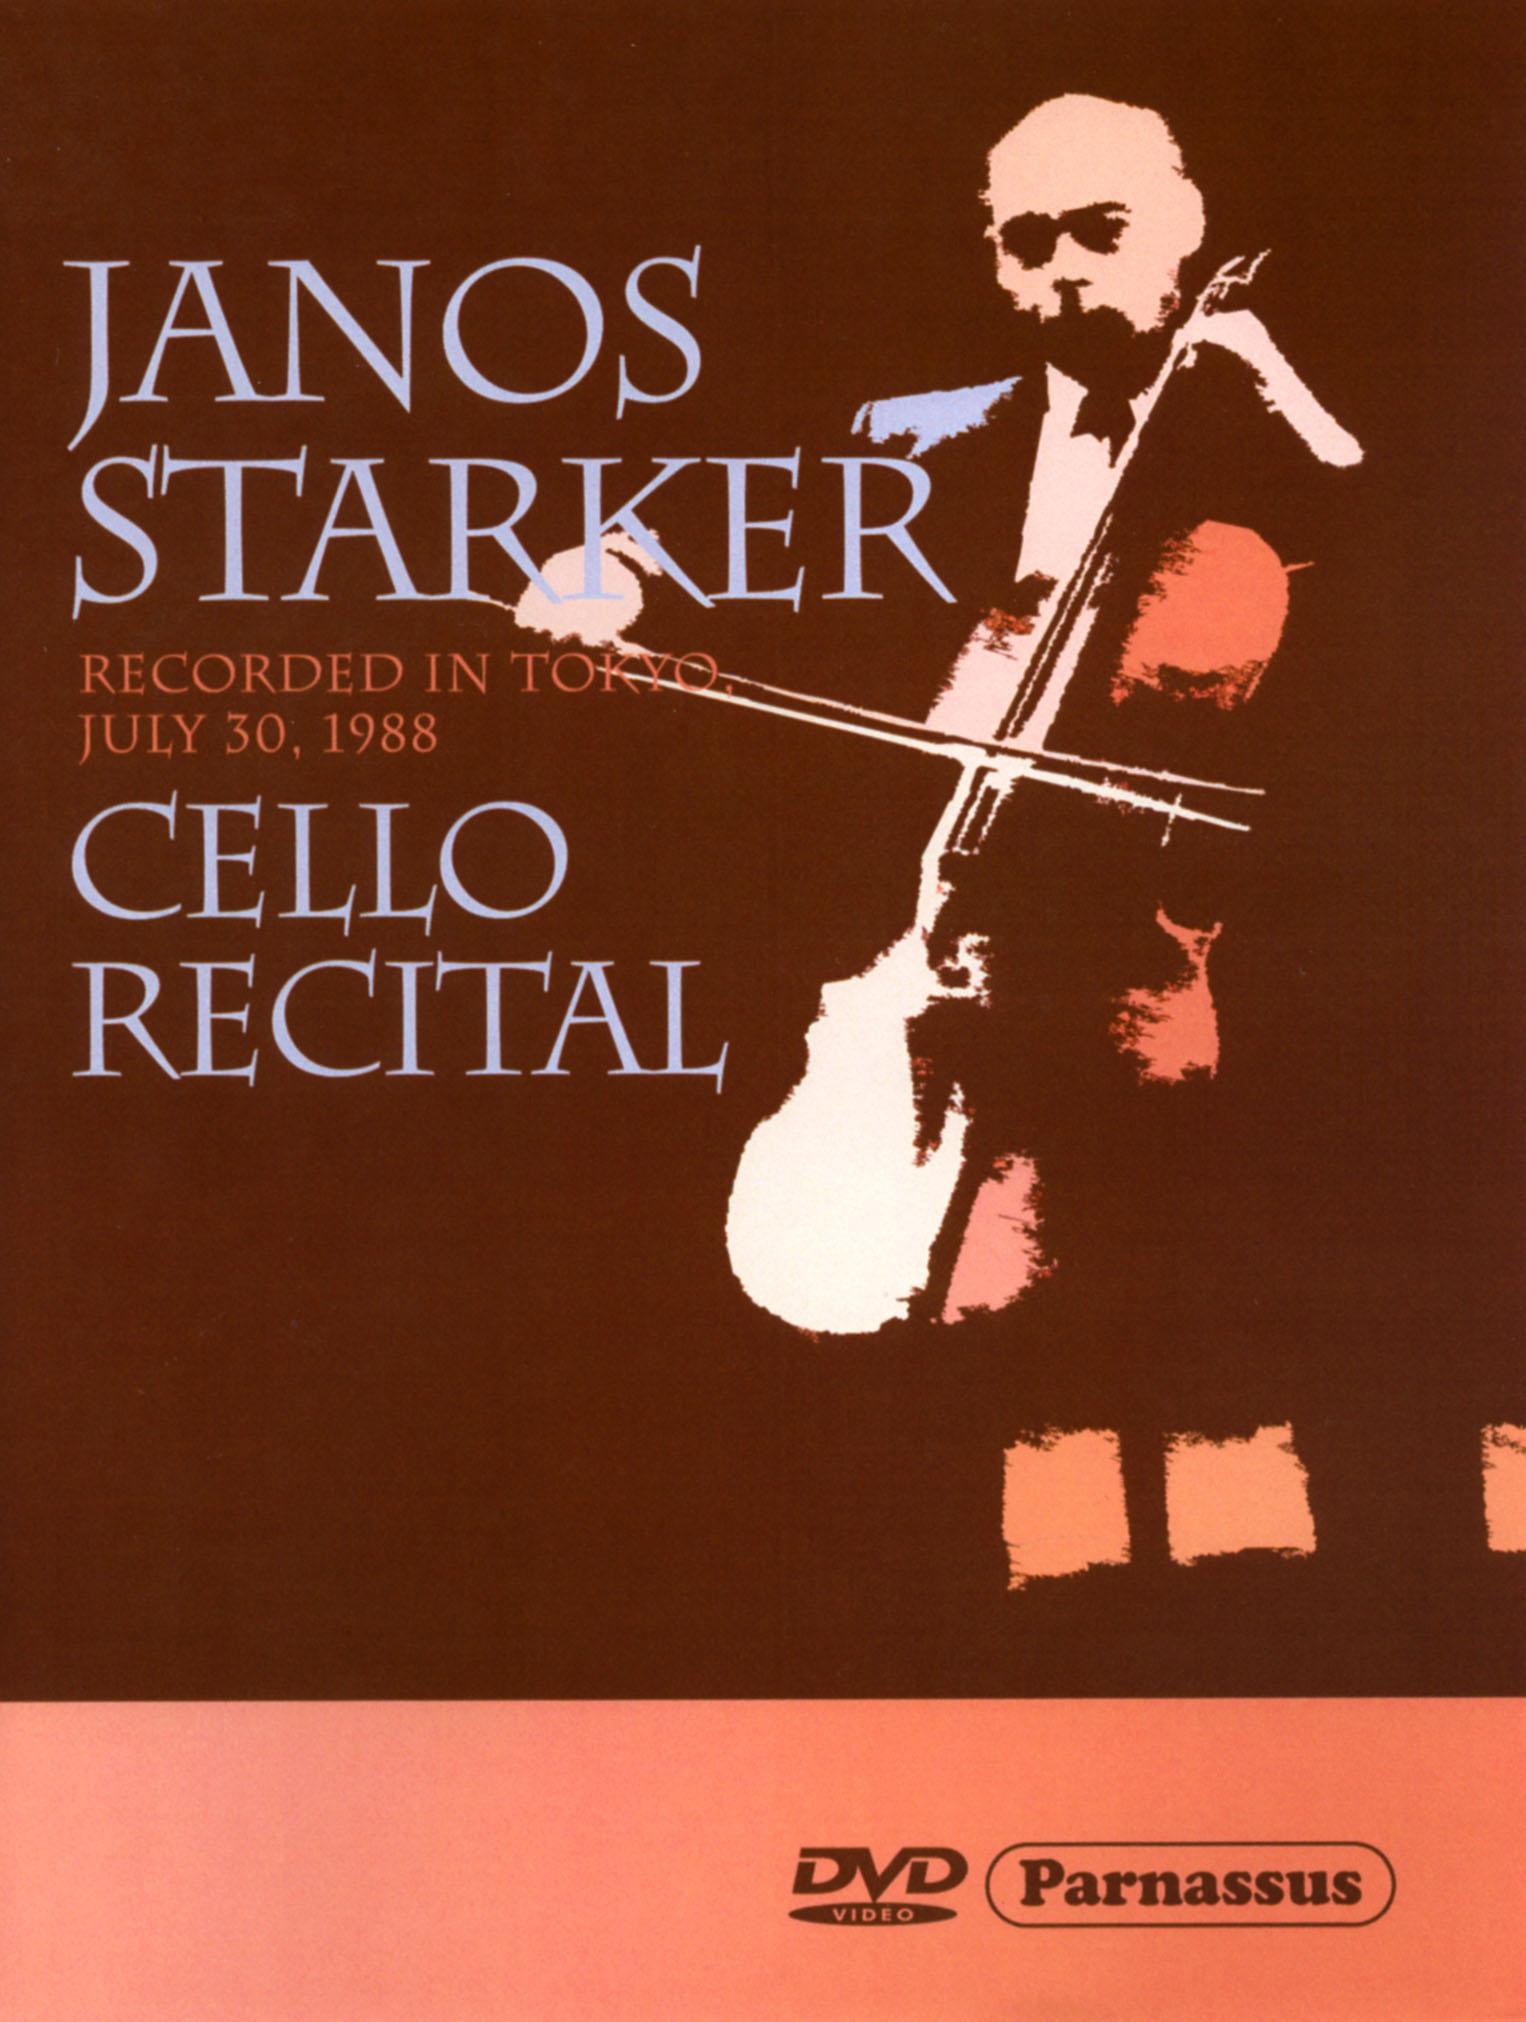 Janos Starker: Cello Recital